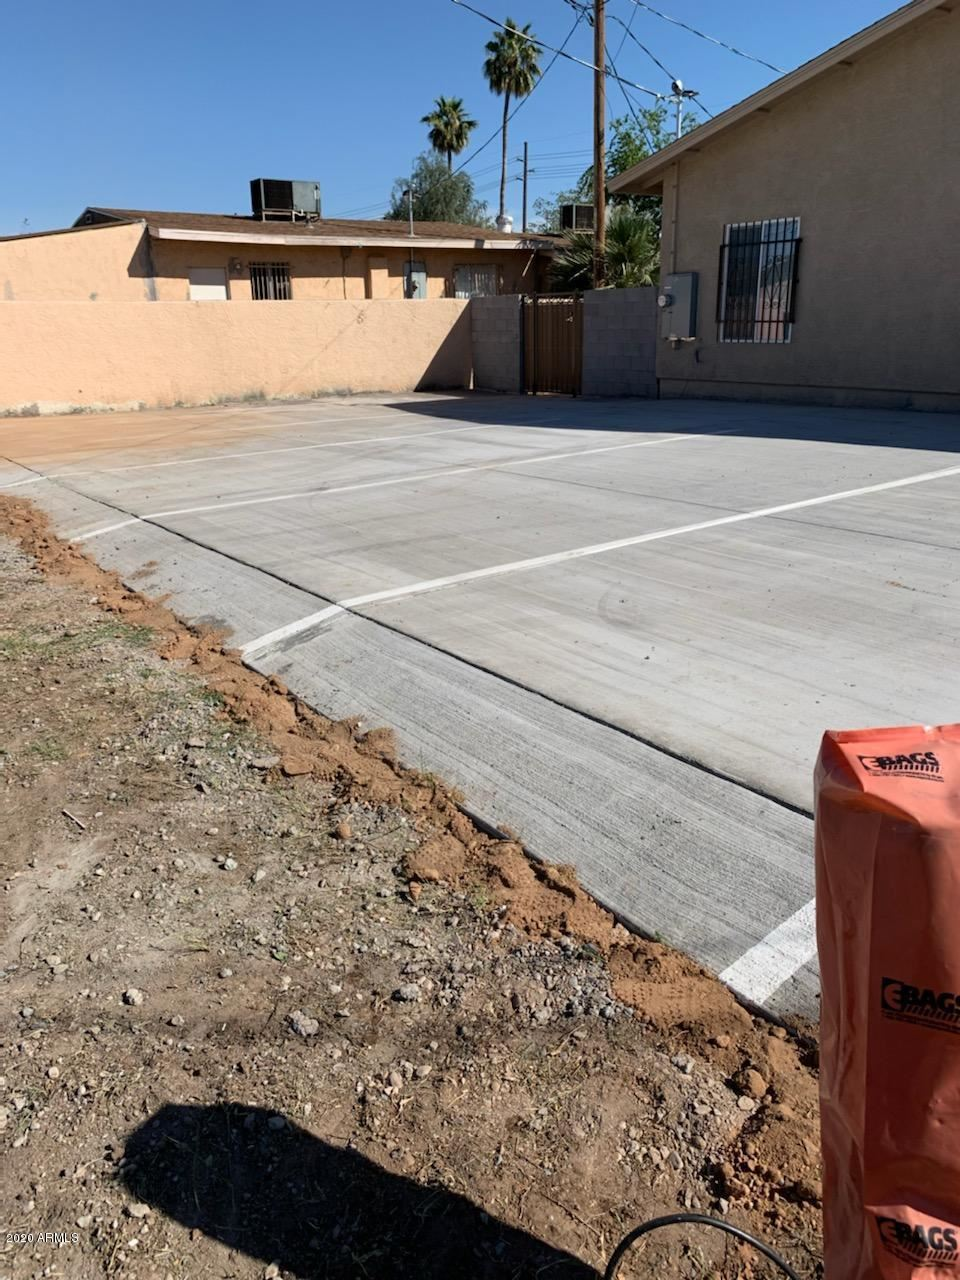 2928 E ROESER Road, Phoenix, AZ 85040 - MLS#: 6124680